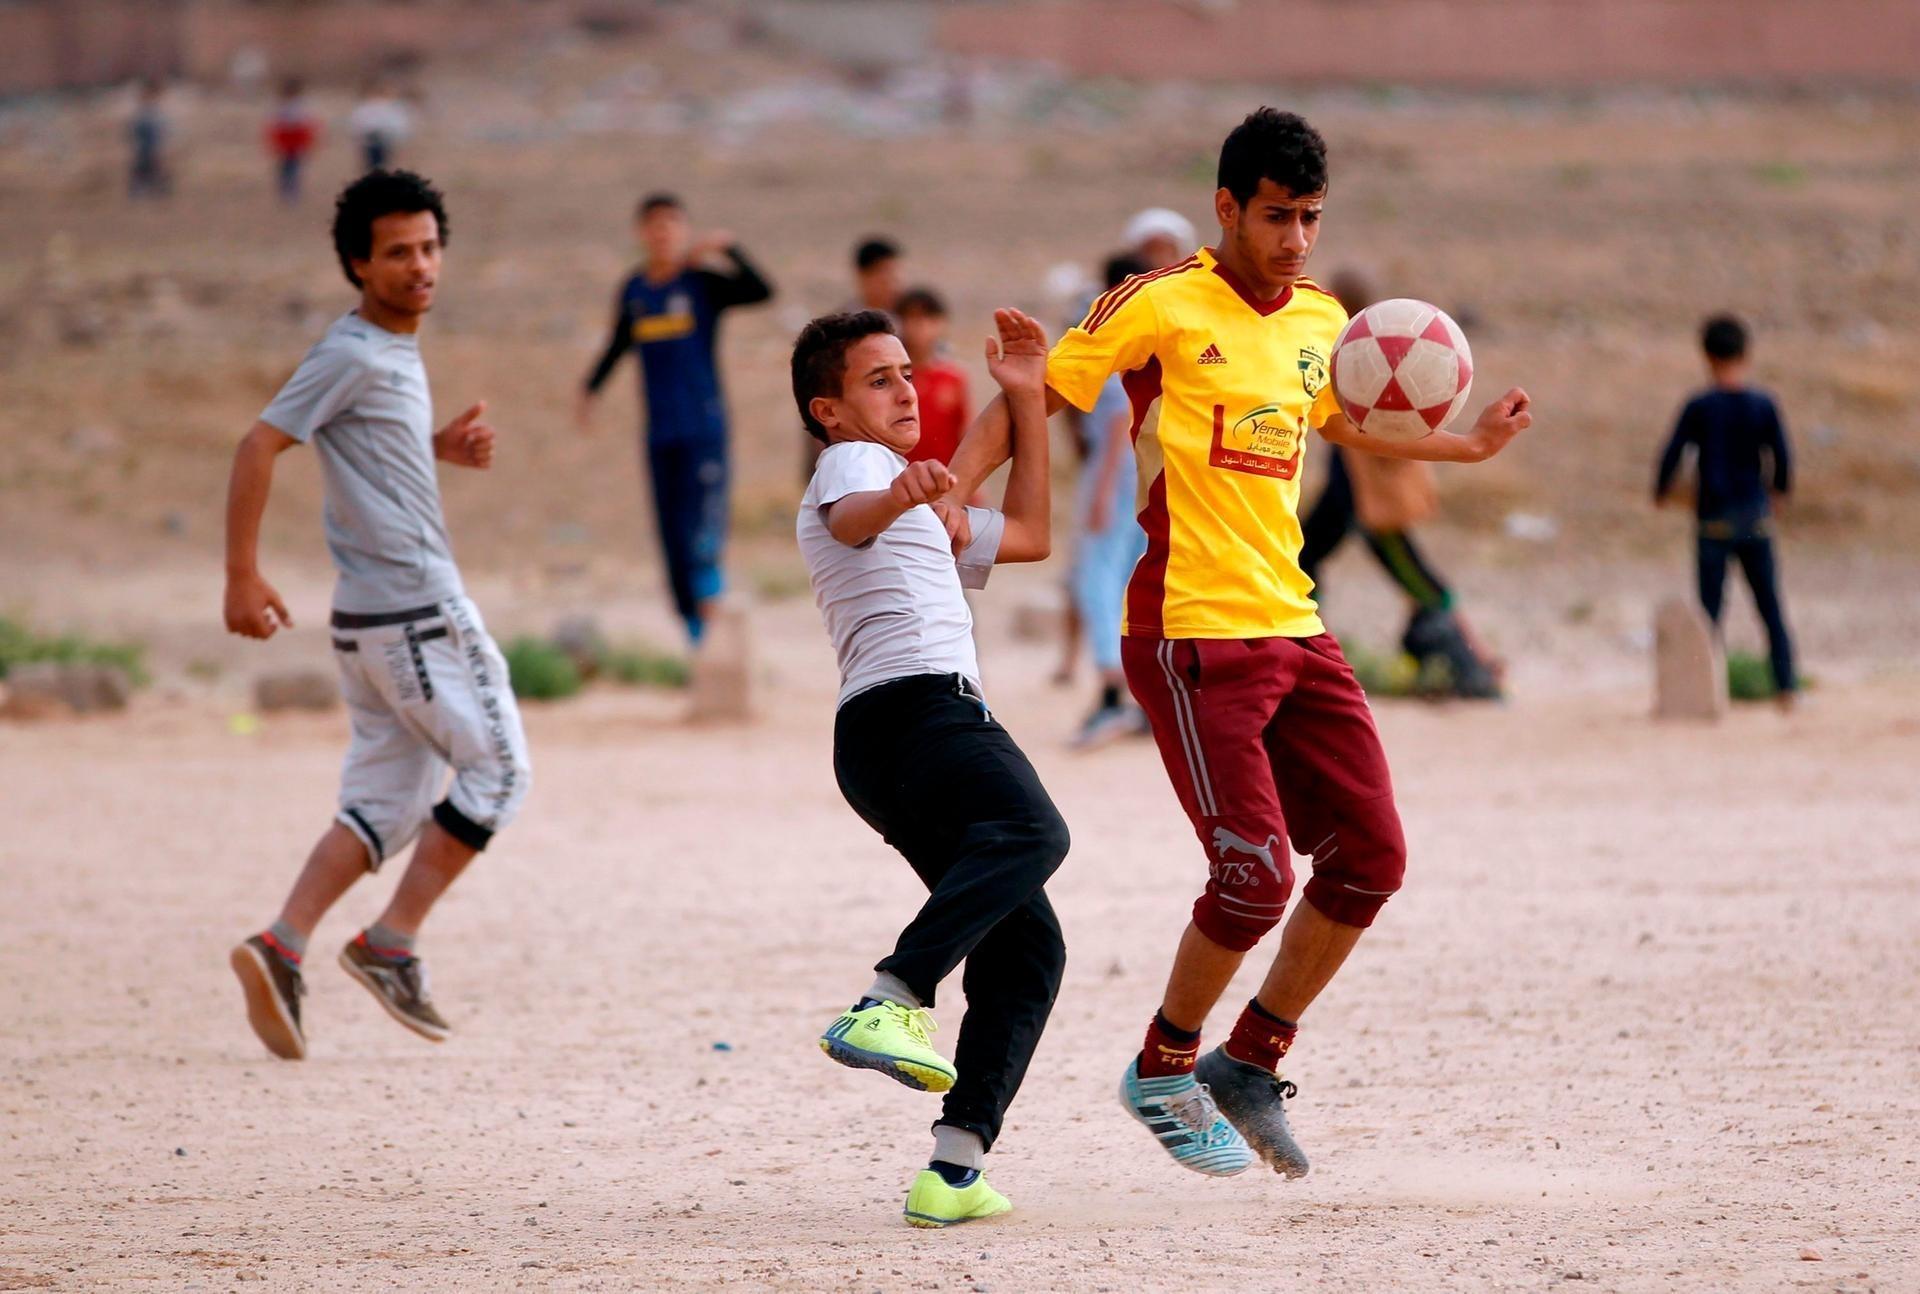 Yemeni youth take part in a football match in their neighbourhood in Sanaa.